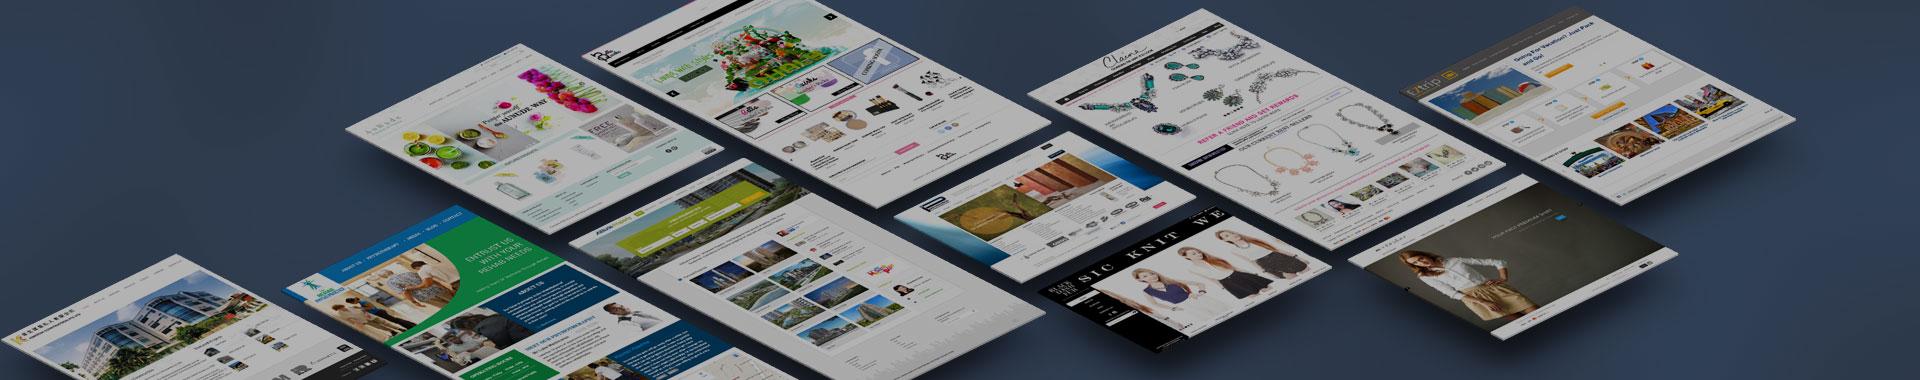 Website Design Singapore - Mashgate